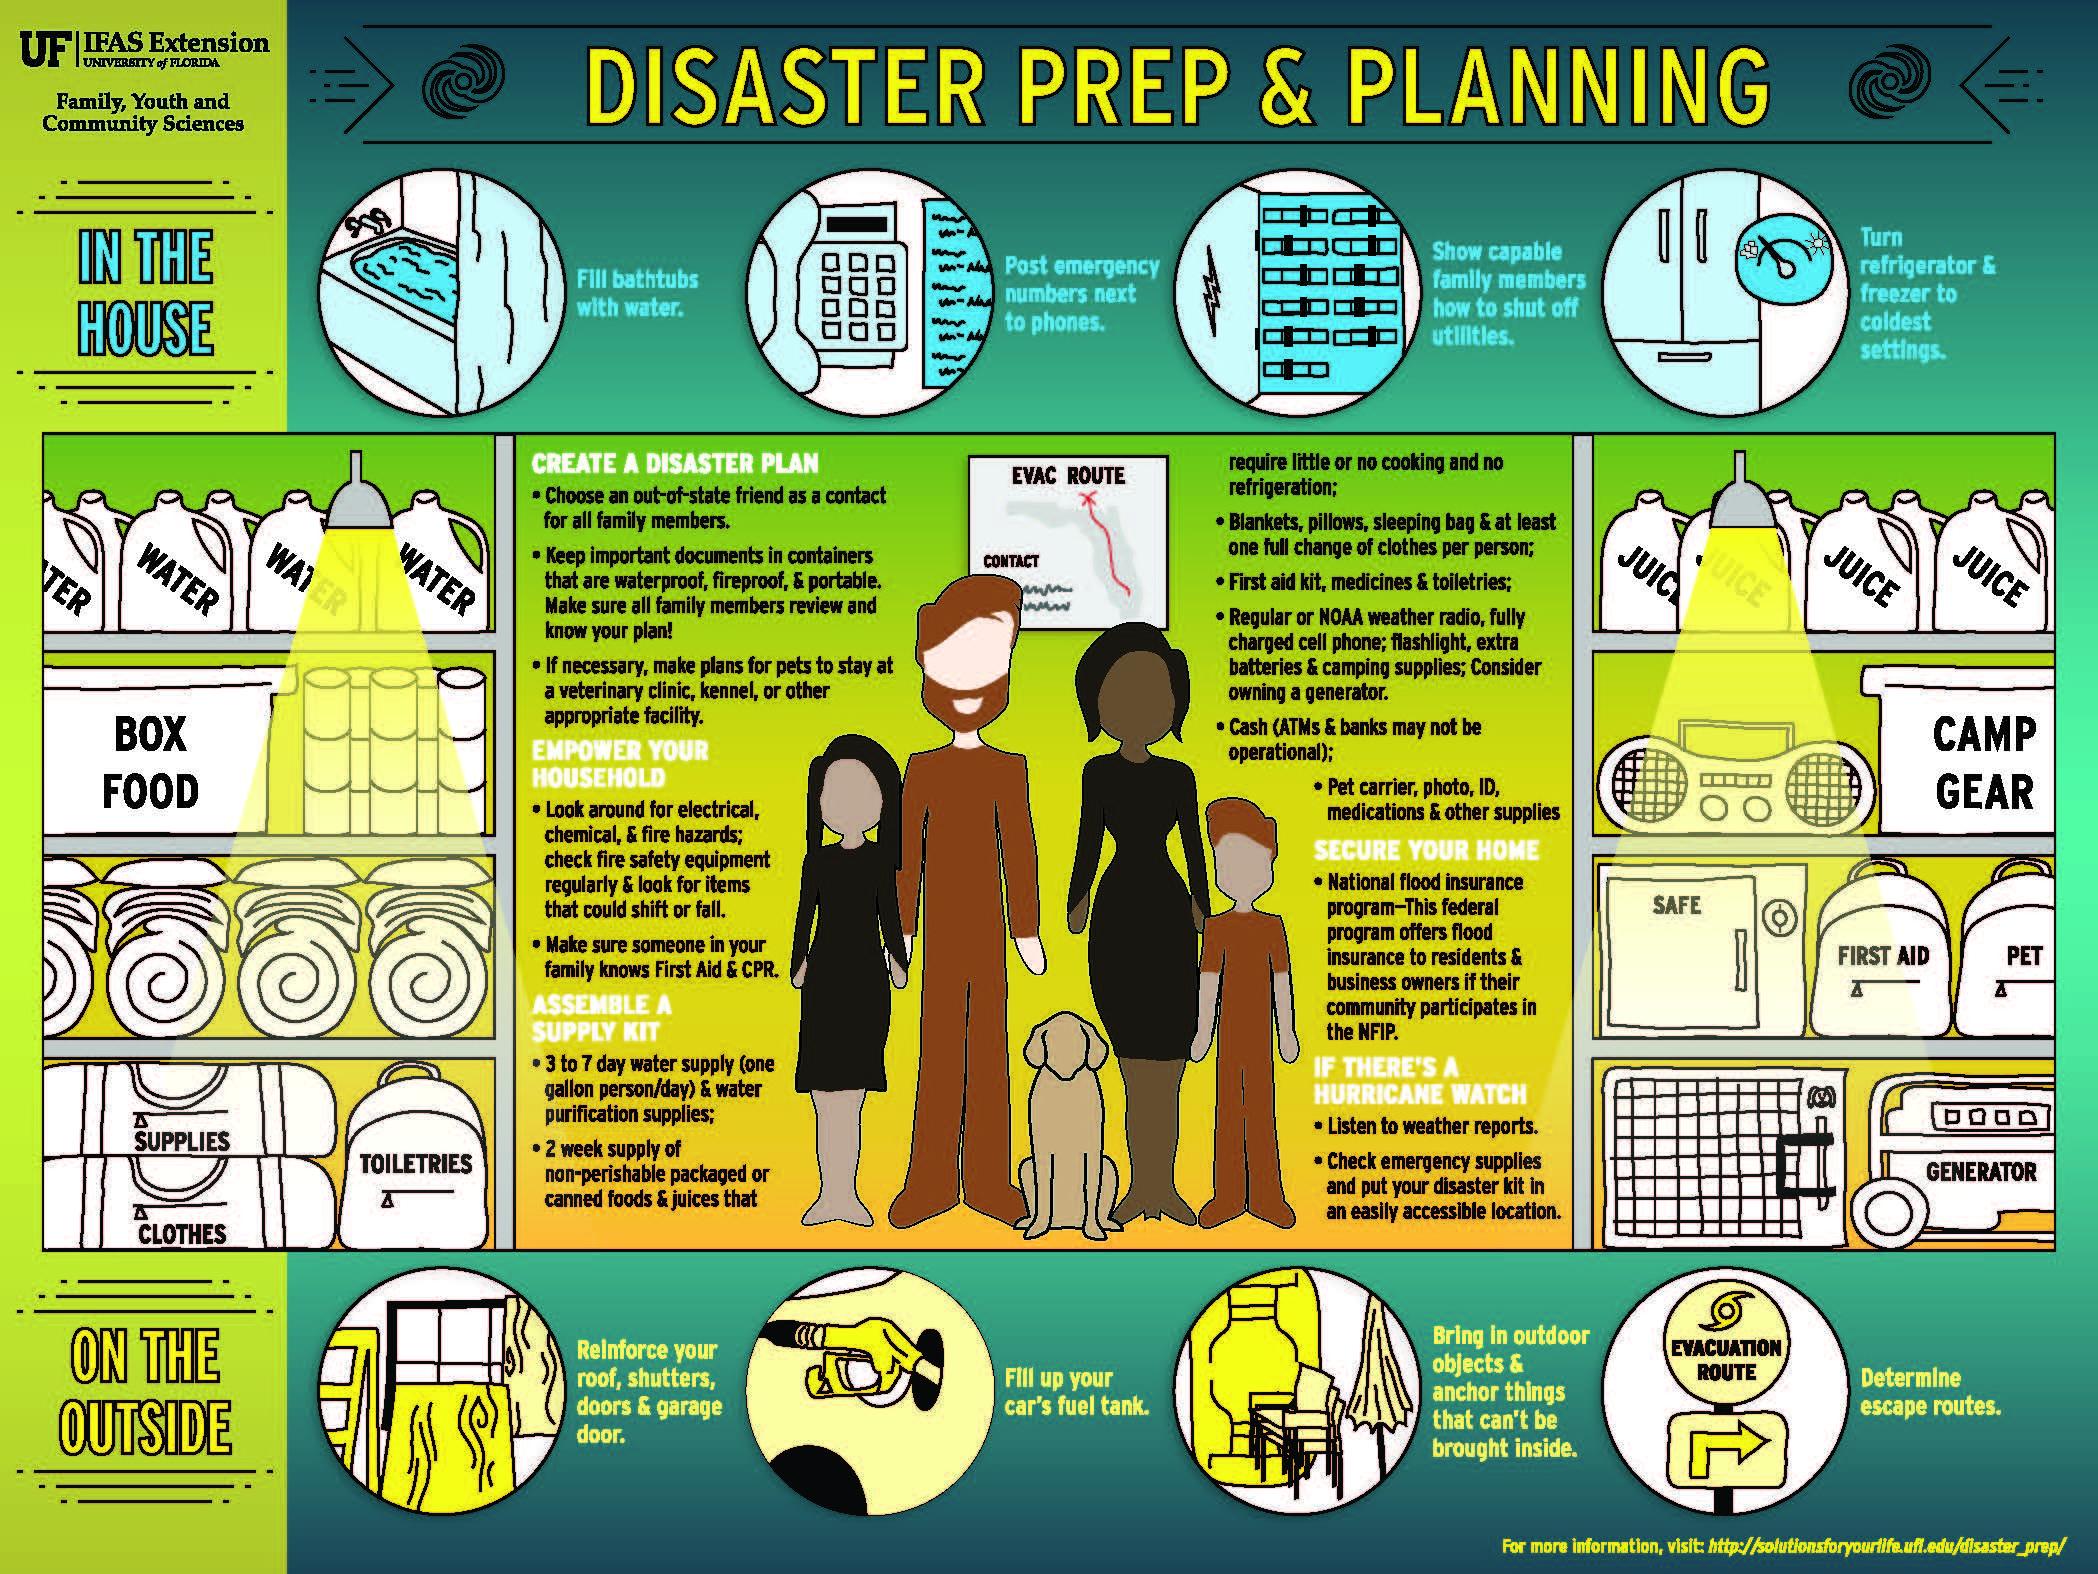 University Of Florida Ifas Disaster Prep Amp Planning Poster